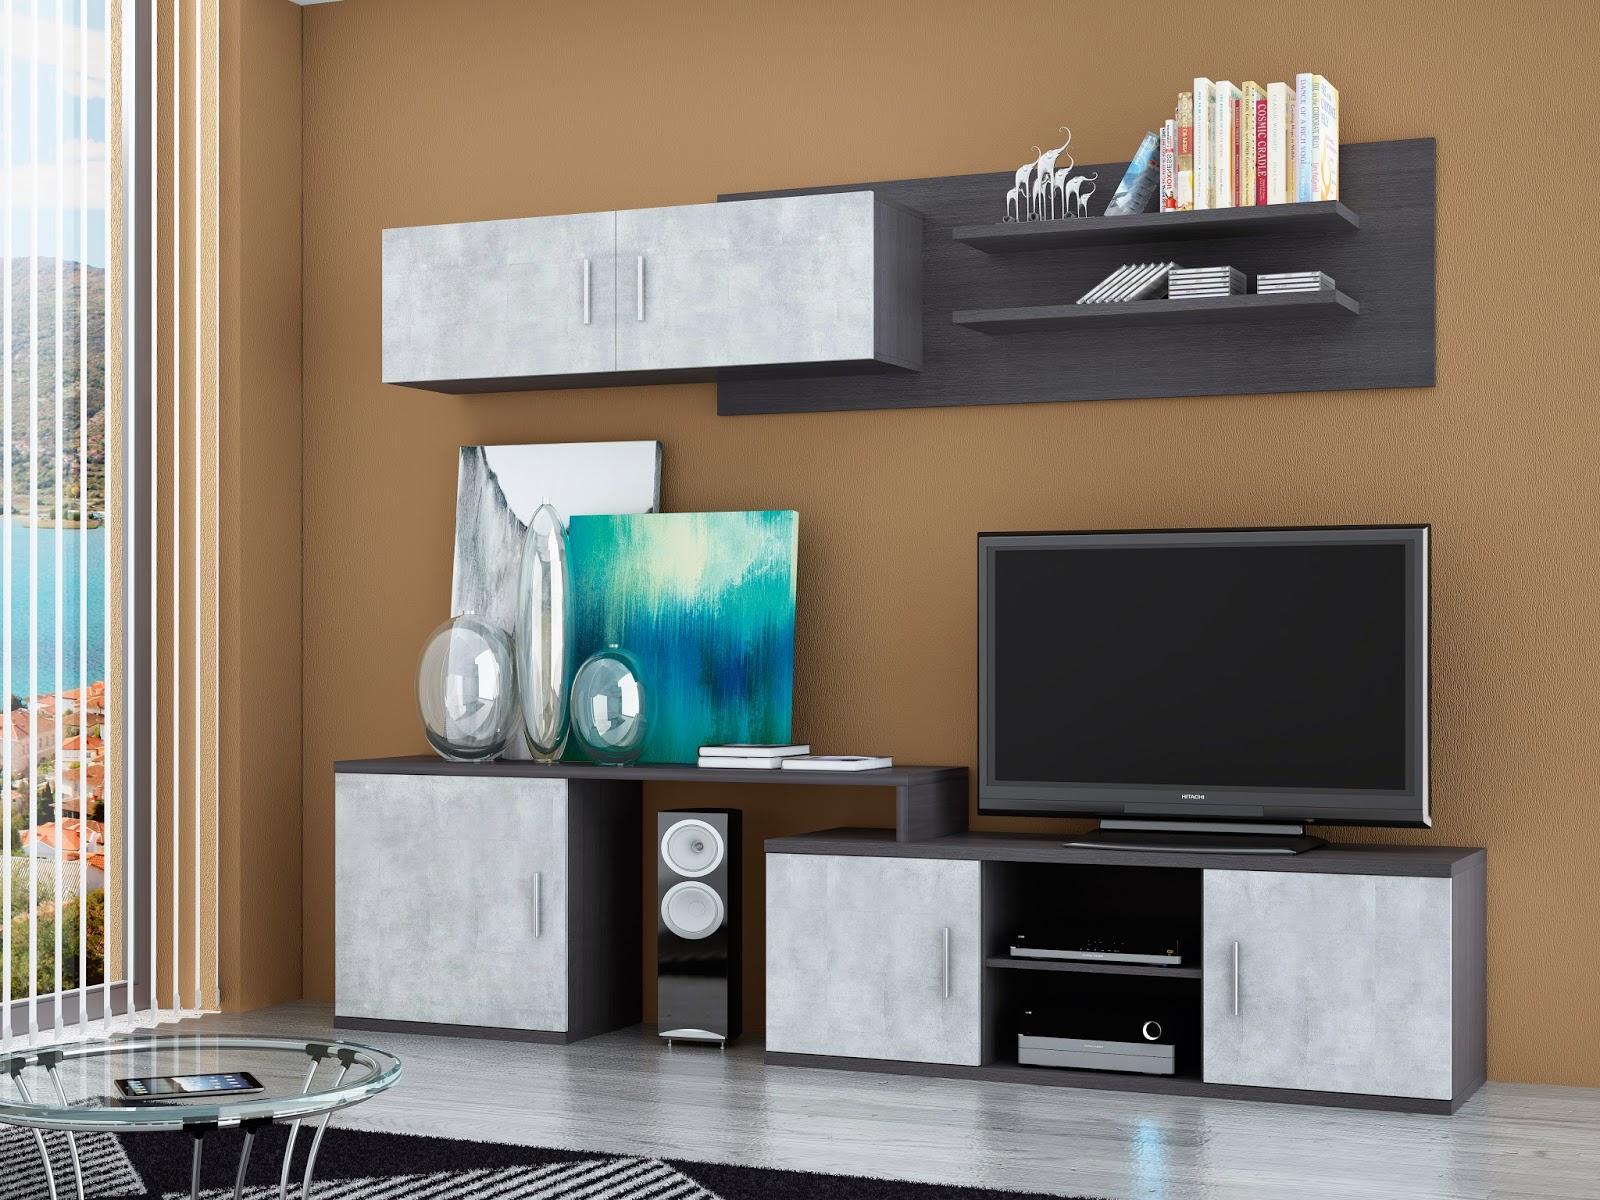 Tu tienda ahorro mueble de salon 240cm for Tu mueble catalogo